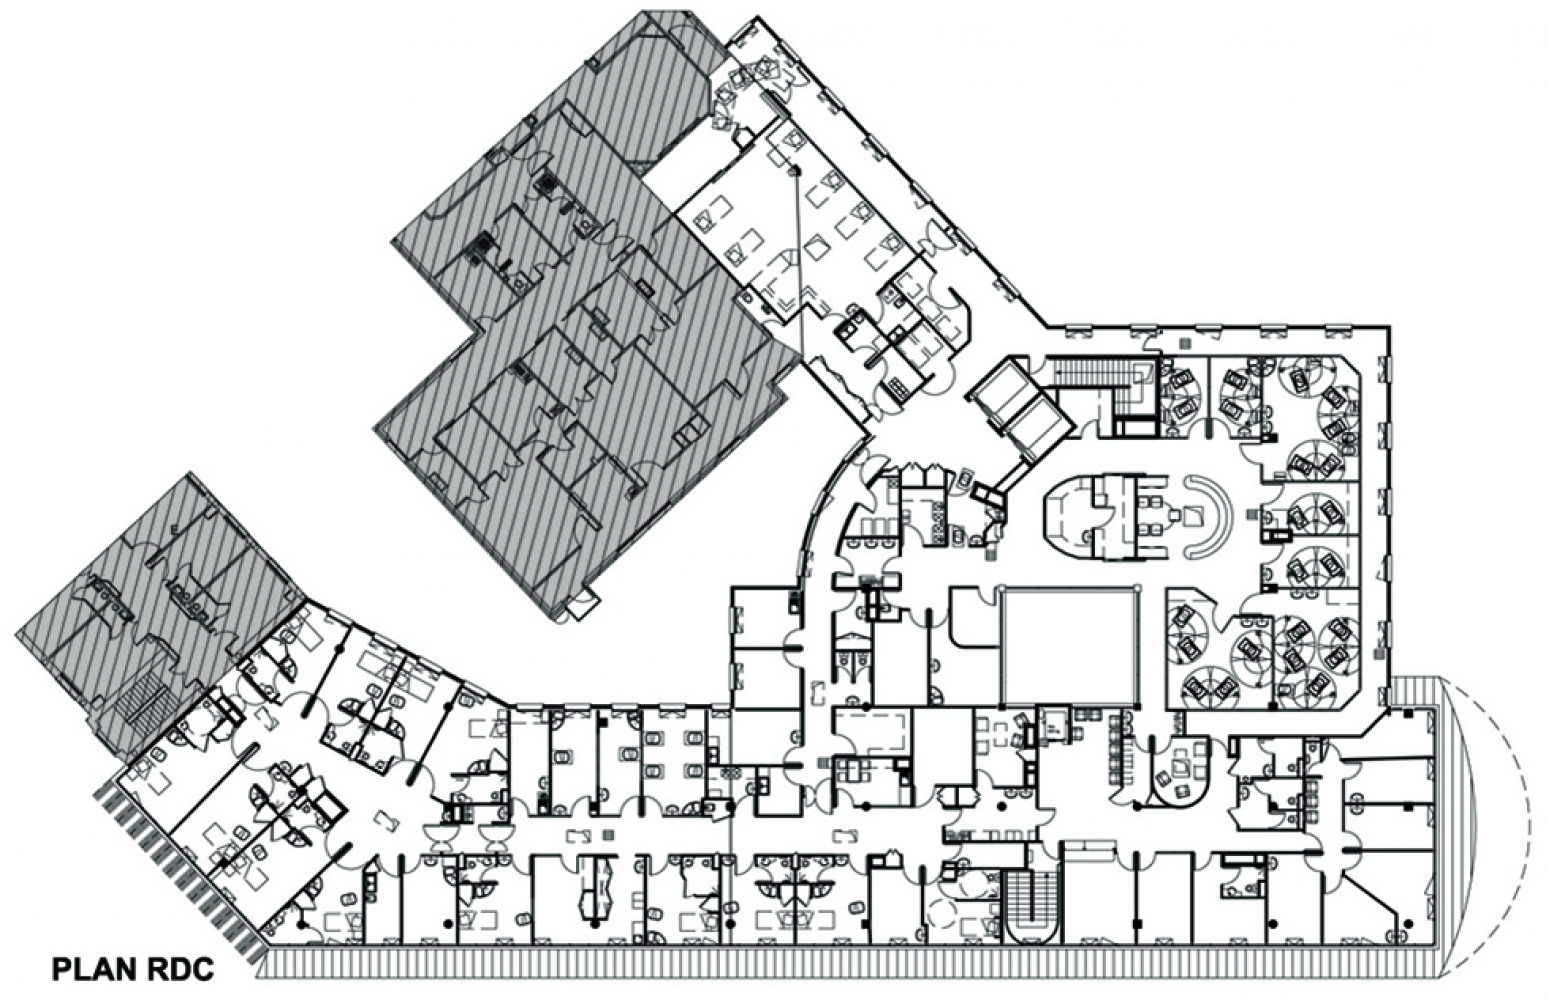 zzval---10 Pascale SEURIN Architecte - Pascale SEURIN Architecte